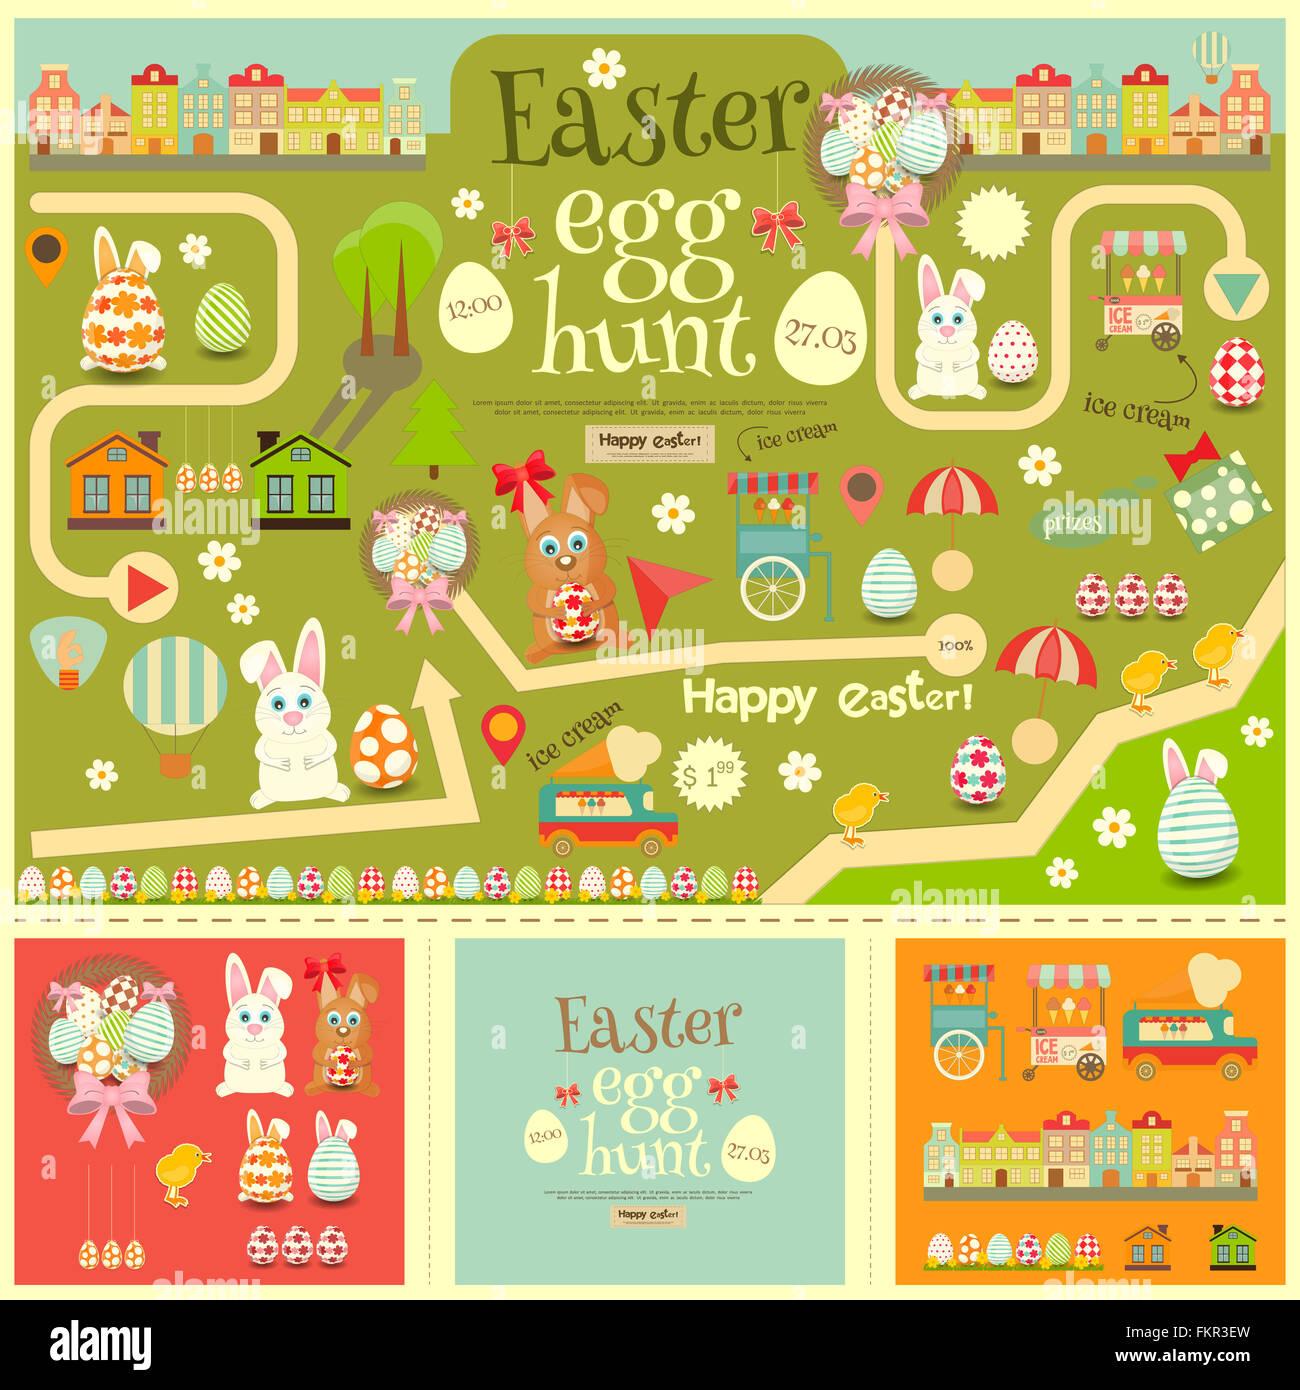 Easter Invitation Card And Easter Elements Easter Egg